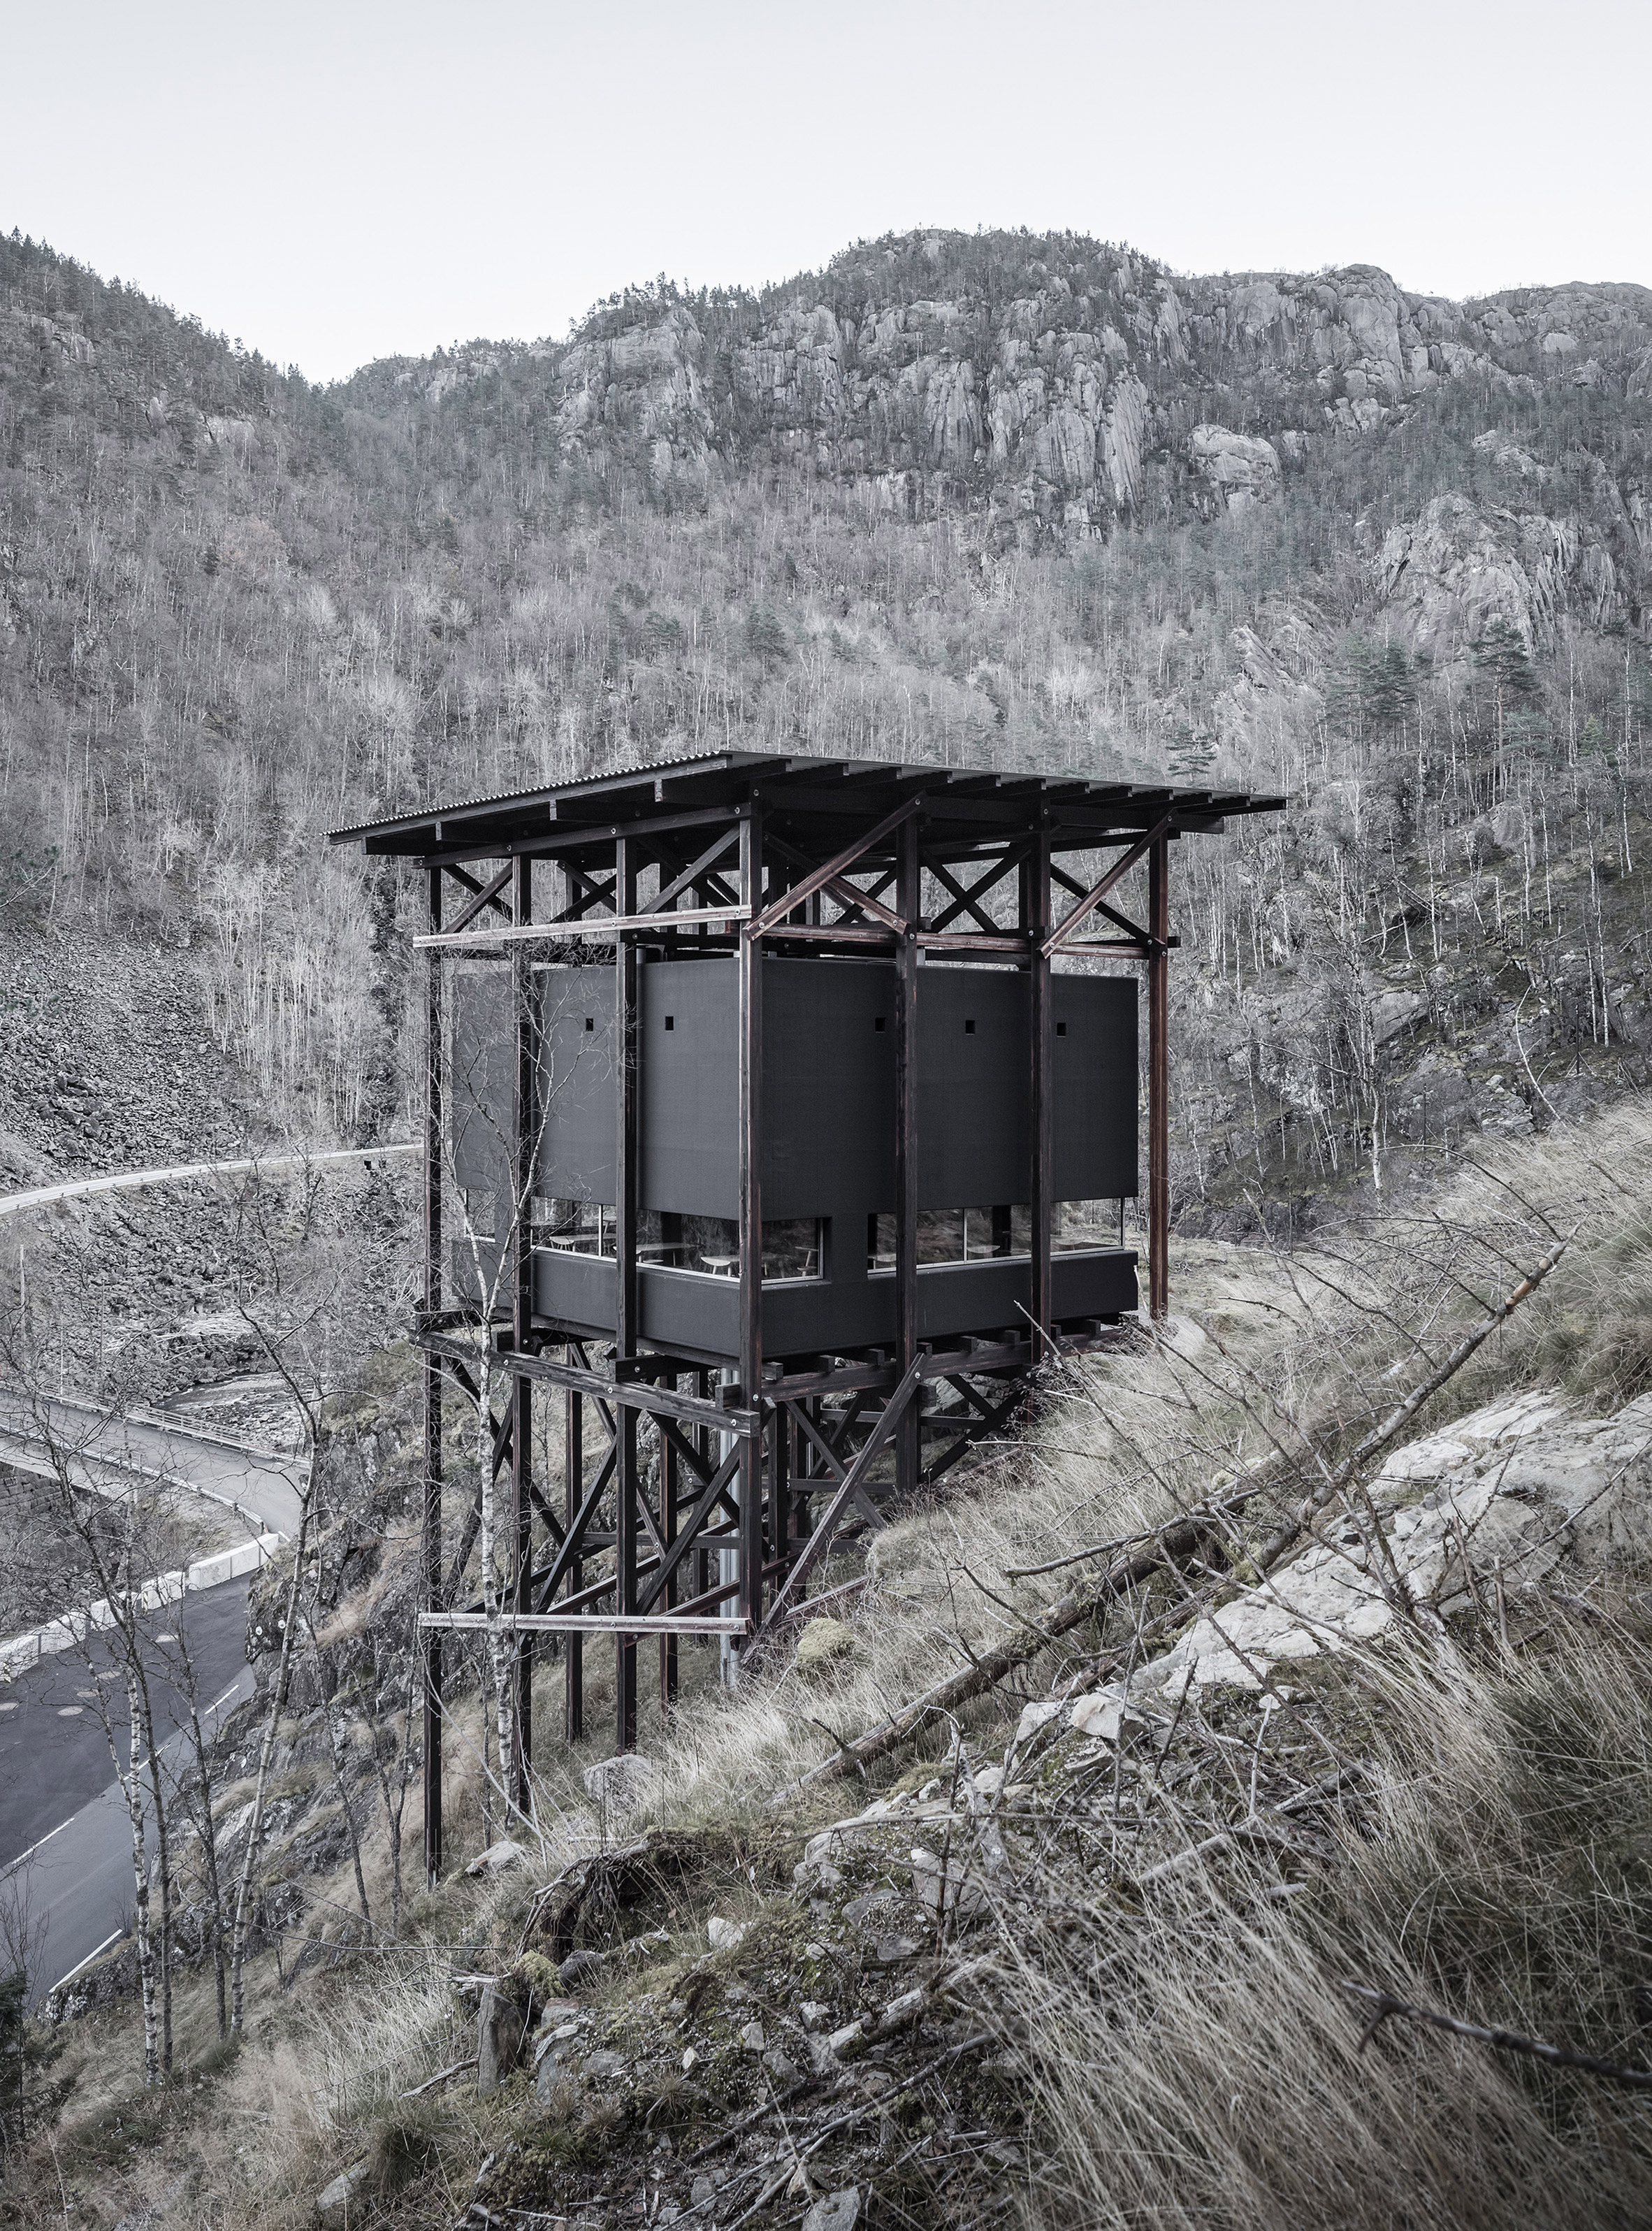 aldo-amoretti-mine-zinc-museum-architecture-photography-_dezeen_2364_col_8.jpg